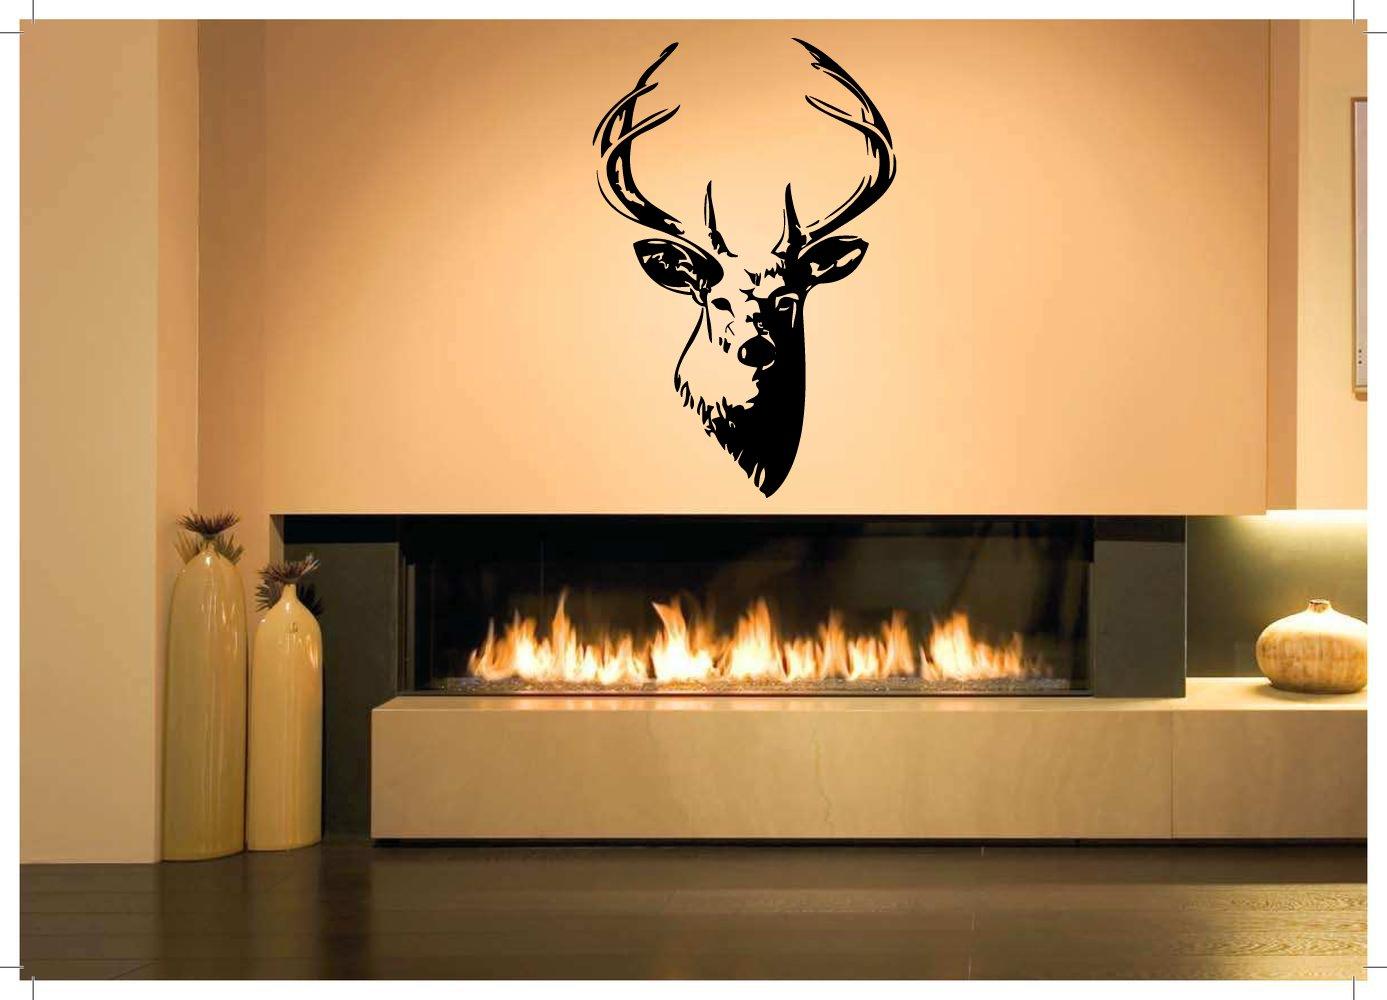 Amazon.com: Wall Room Decor Art Vinyl Decal Sticker Mural Deer Head ...